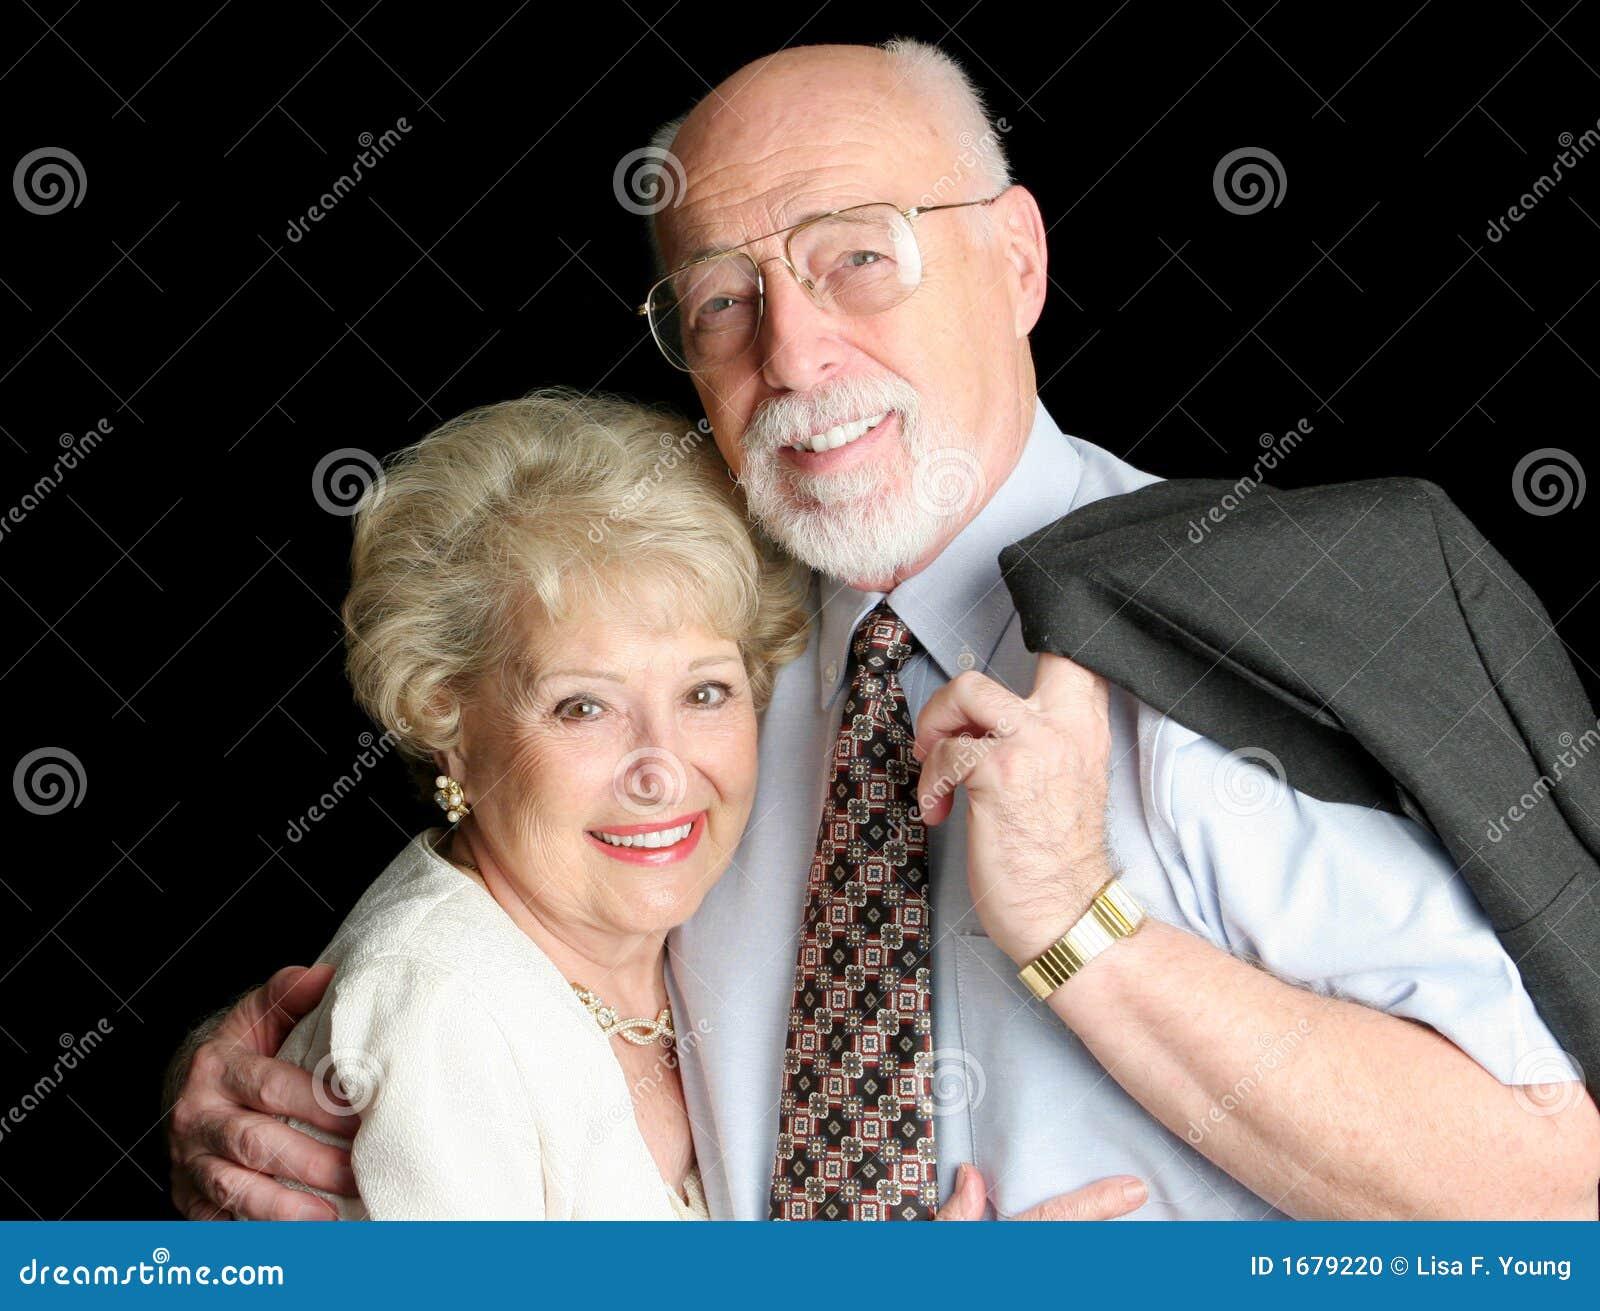 Stock Photo of Loving Senior Couple